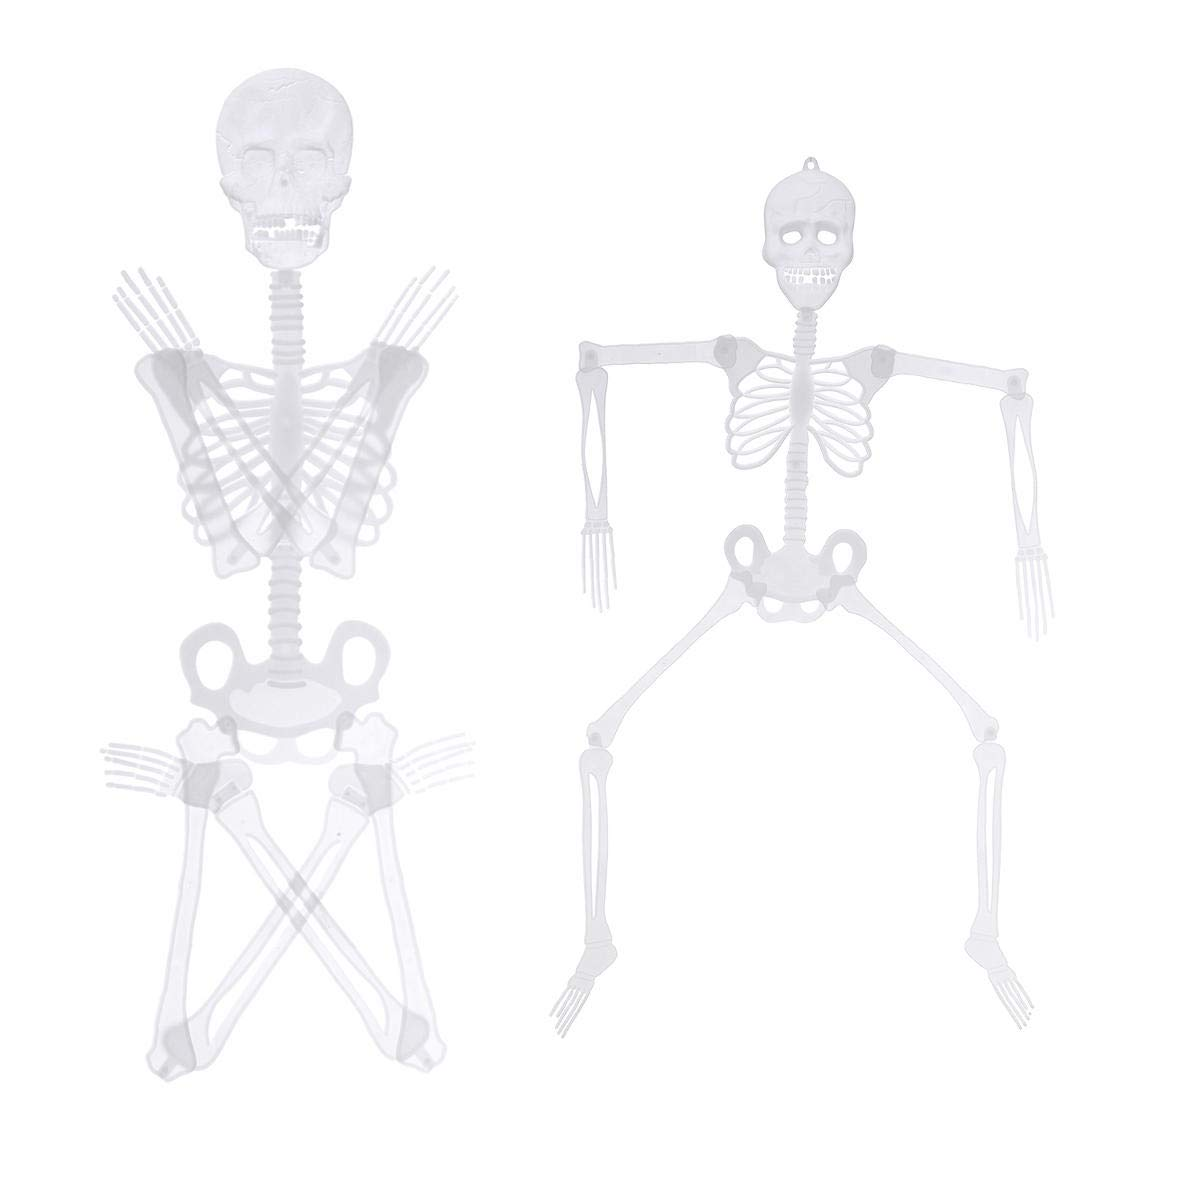 Halloween Luminou Human Skeleton Decoration Classroom Occasionally Adjustable - 1PCs by Unknown (Image #5)